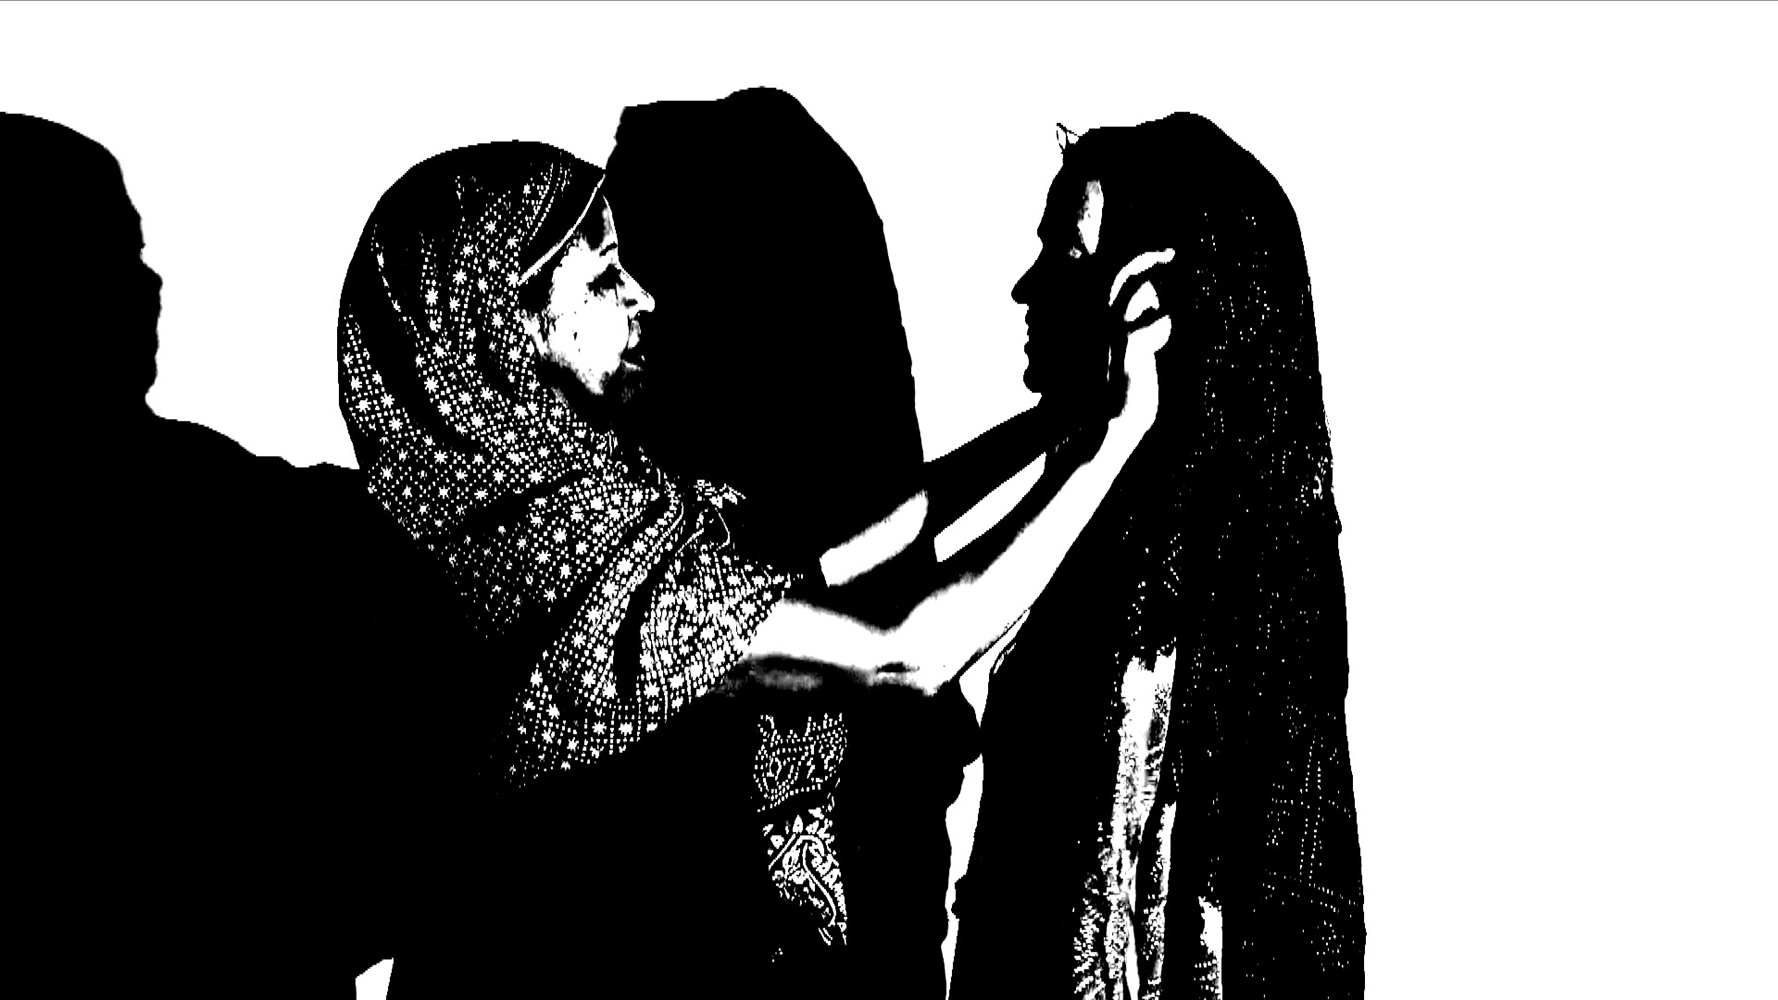 """Sisterhood, Shared Threads"" Video, .mov (NTSC). Duration: 1:32. 2016. https://vimeopro.com/fuzeart/sisterhood-shared-threads"